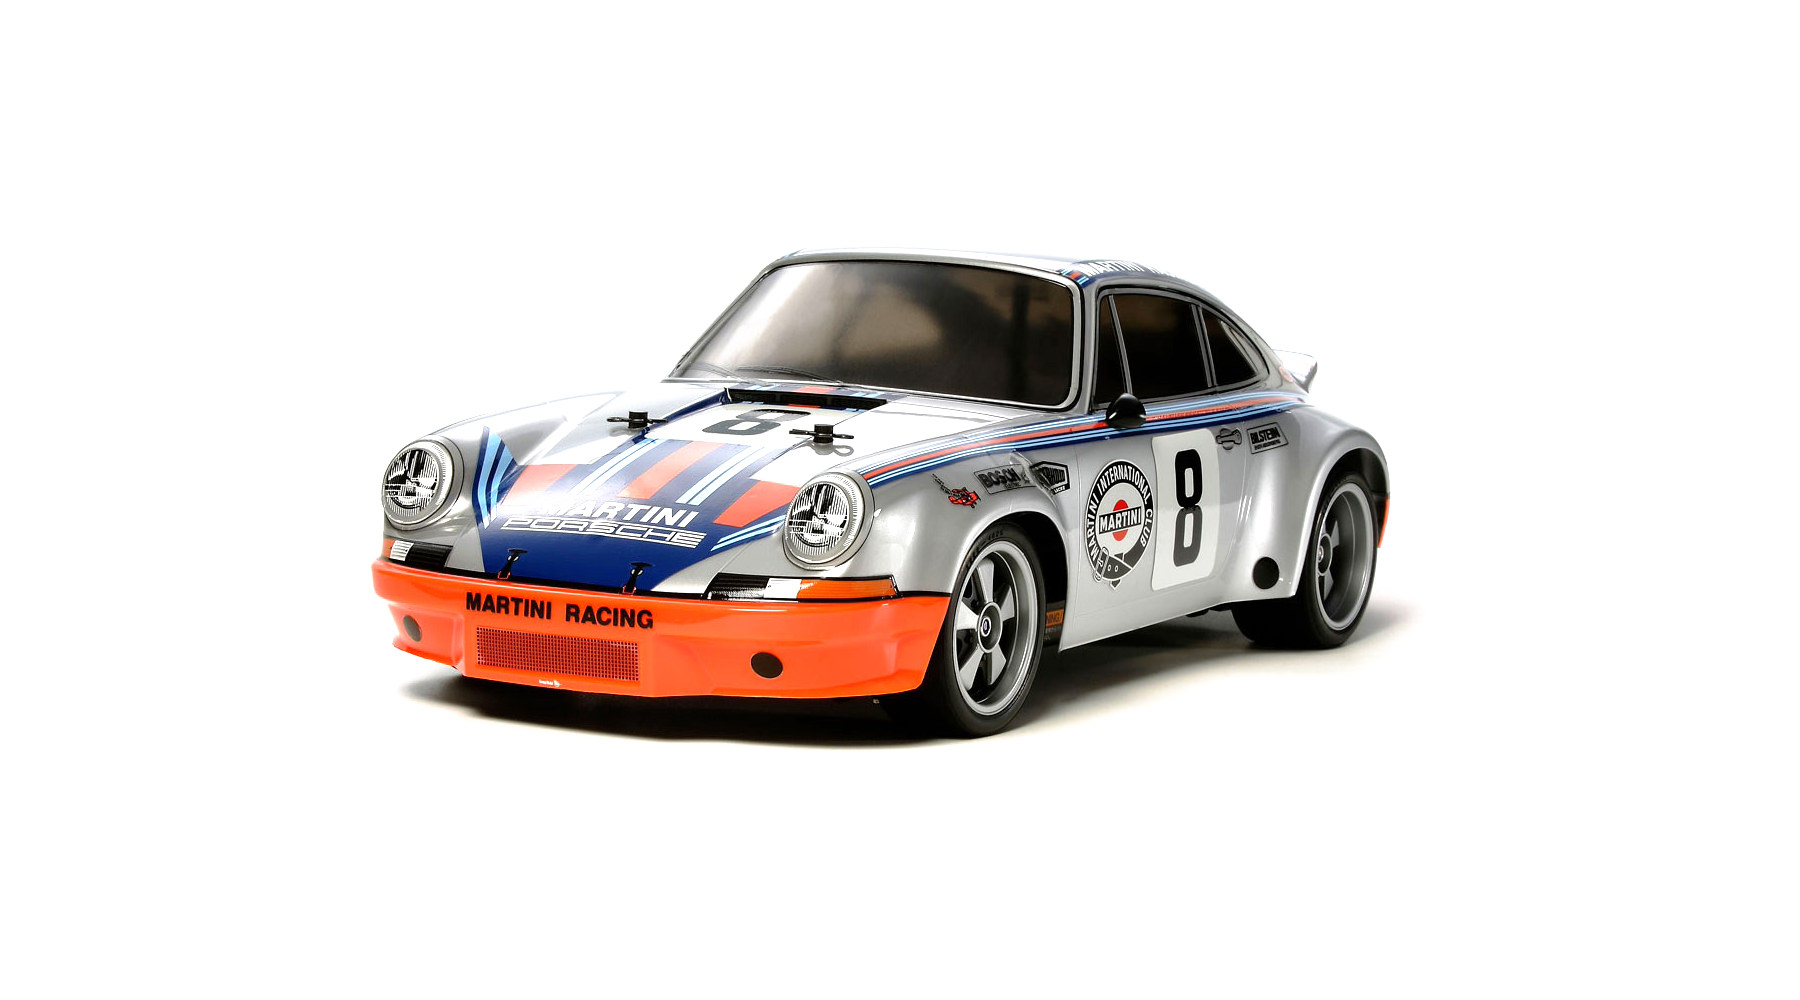 Porsche 911 Carrera RSR Tamiya Remote Control Model